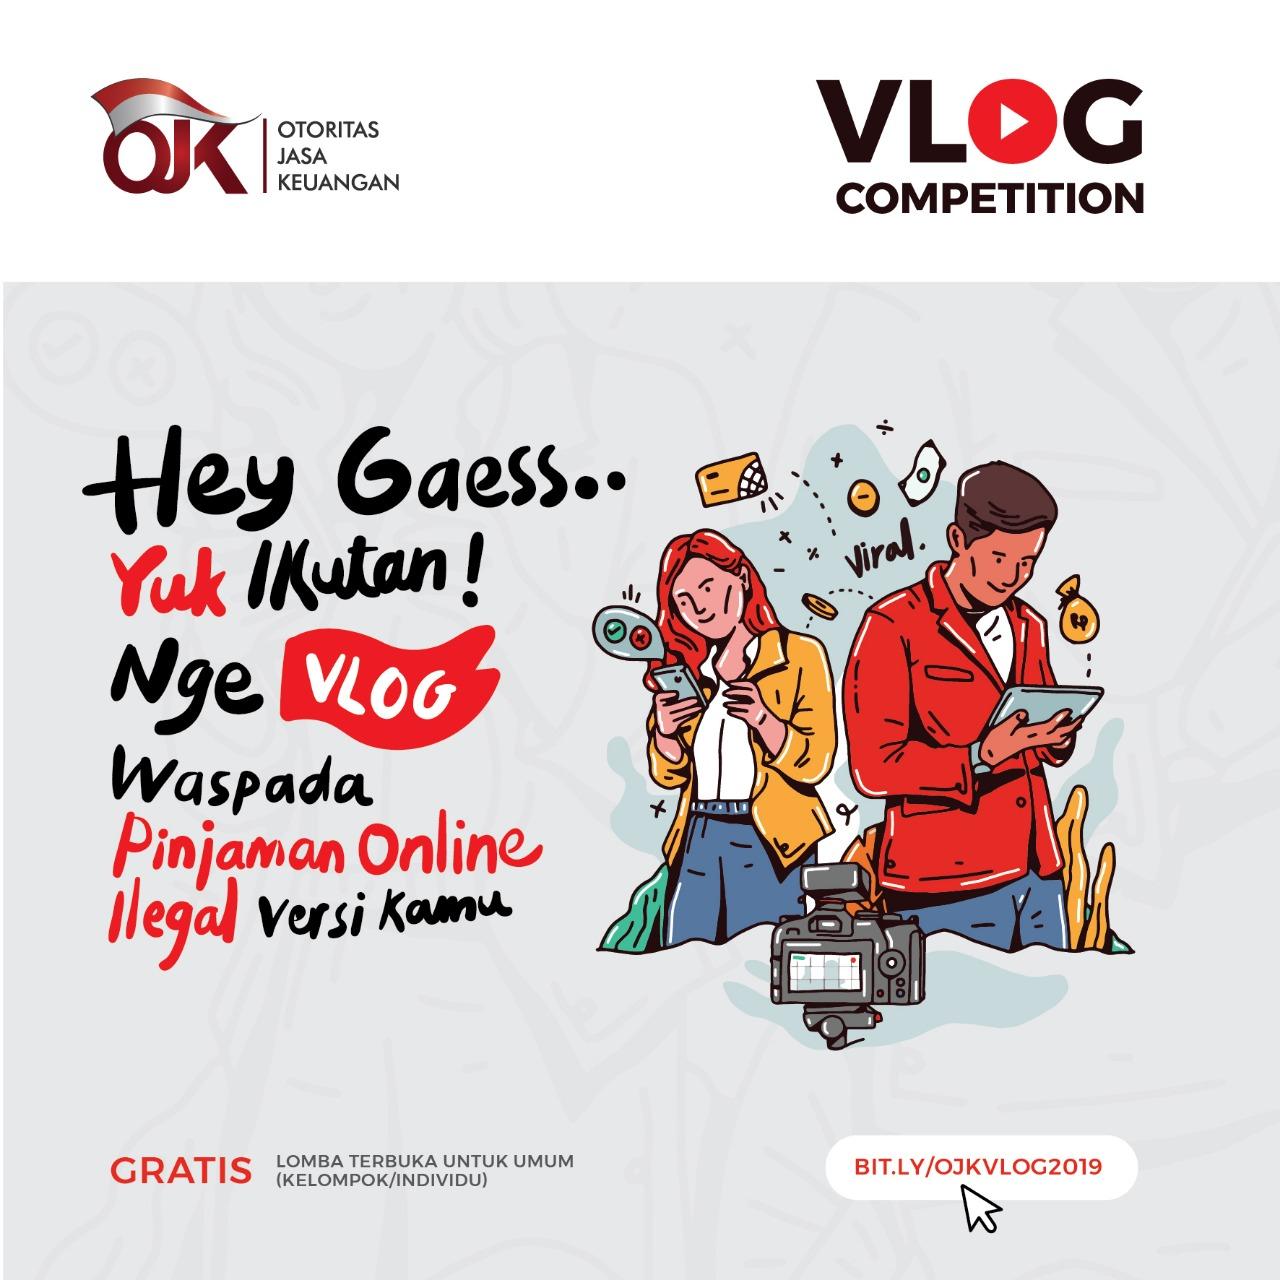 Vlog Competition Waspada Pinjaman Online Ilegal Versi Kamu